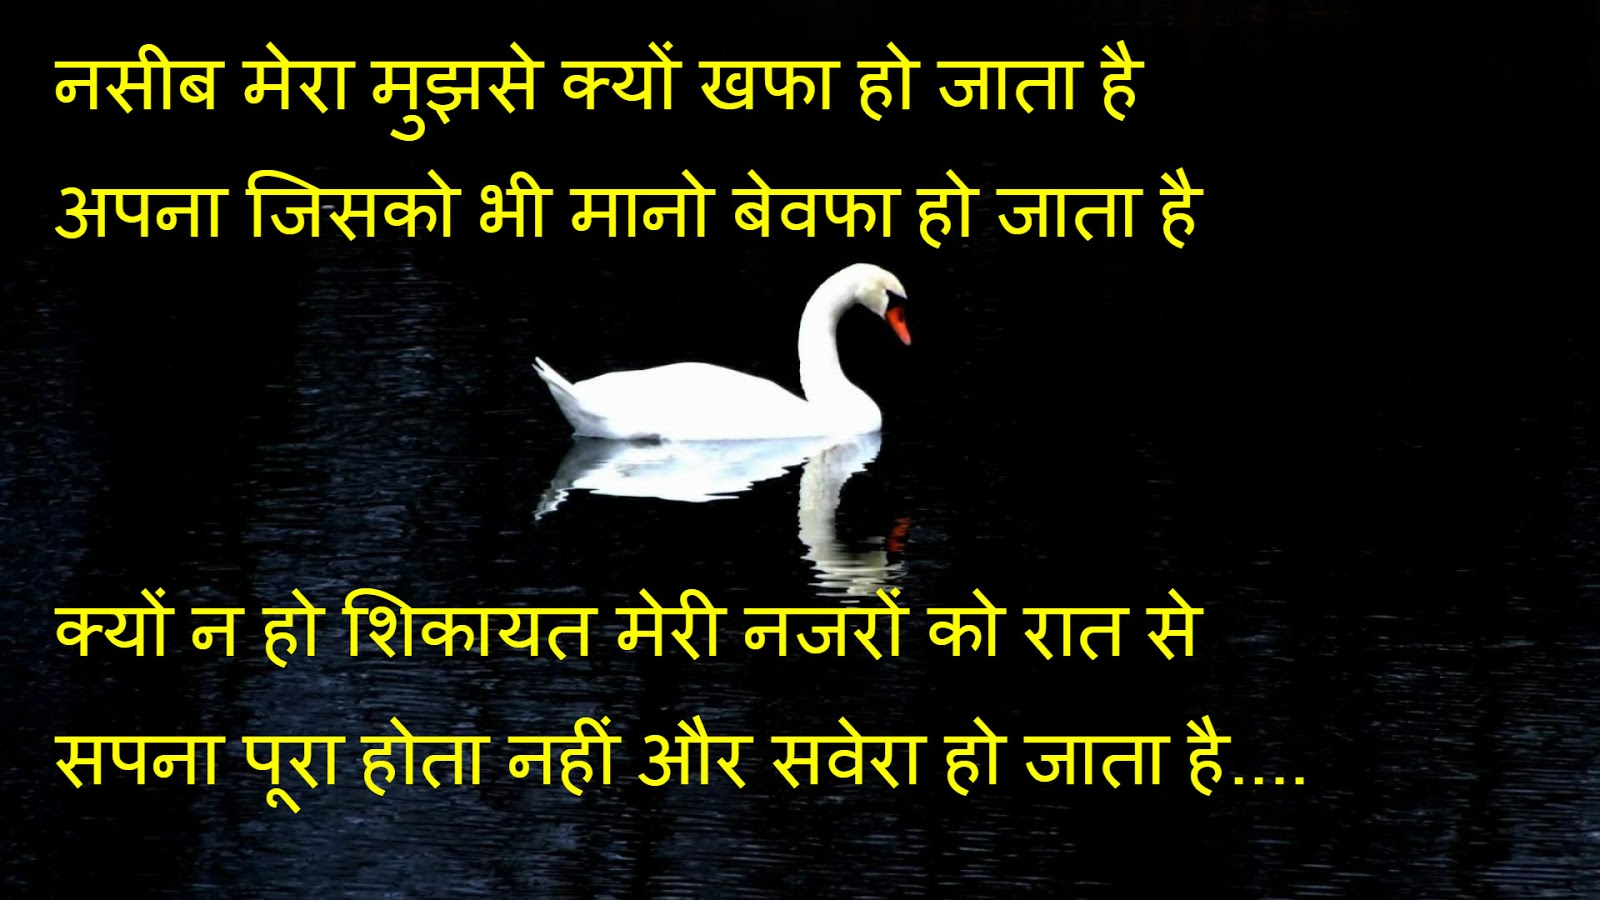 Sad Shayari In Hindi For Friend   www.galleryhip.com - The Hippest ...